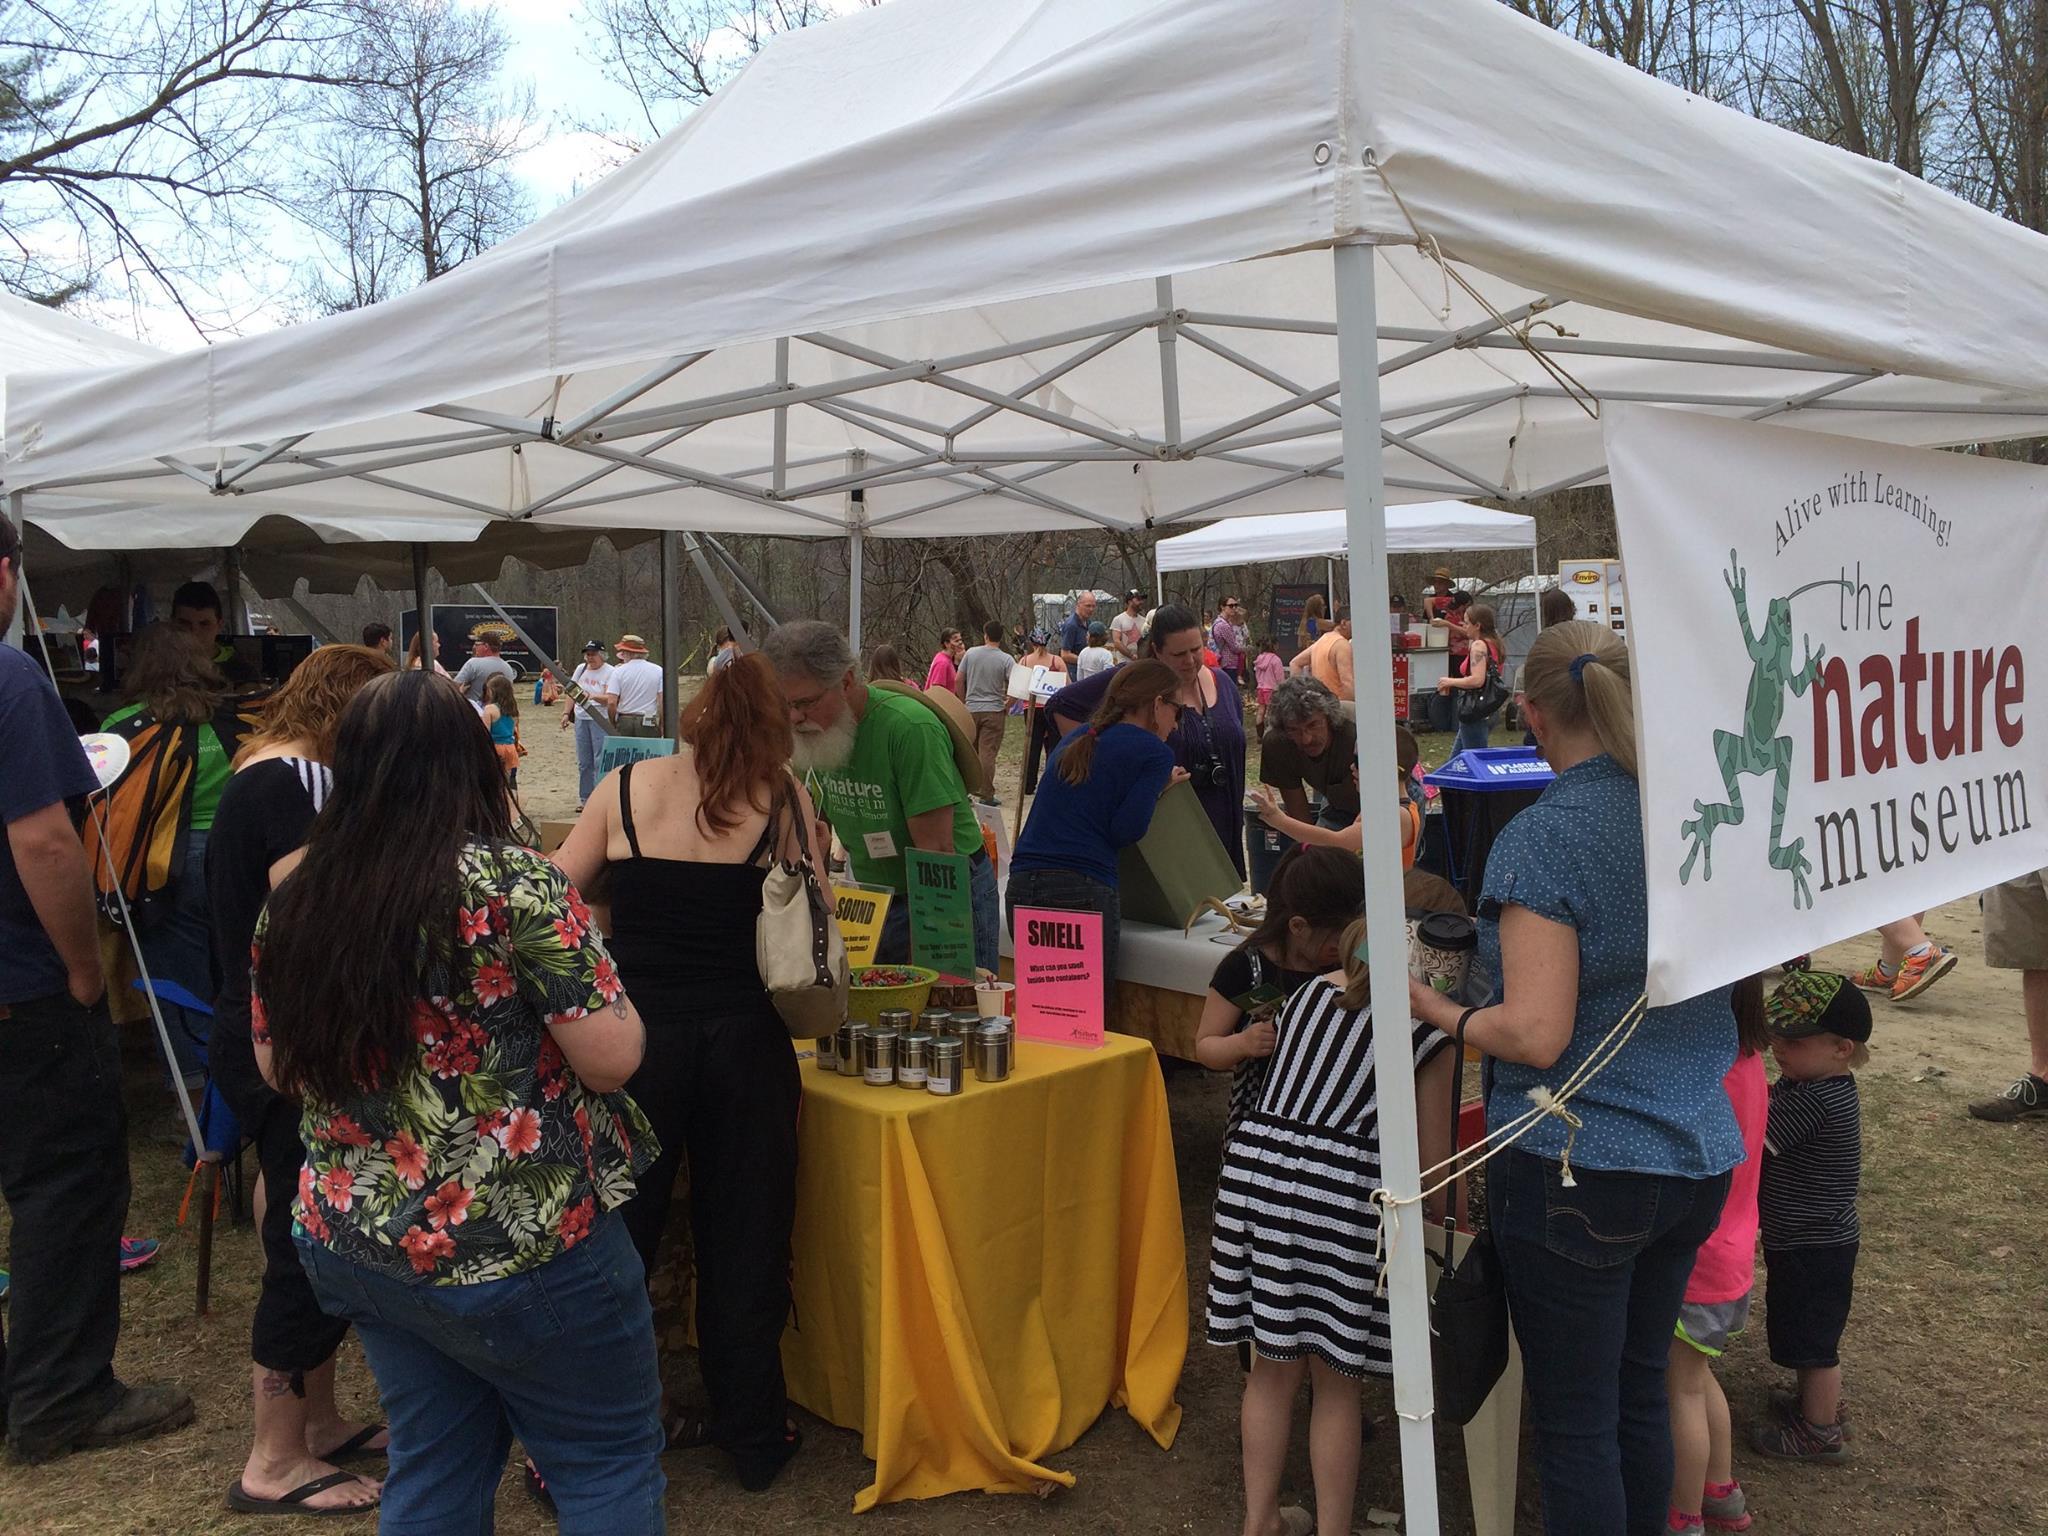 16th Annual Herricks Cove Wildlife Festival